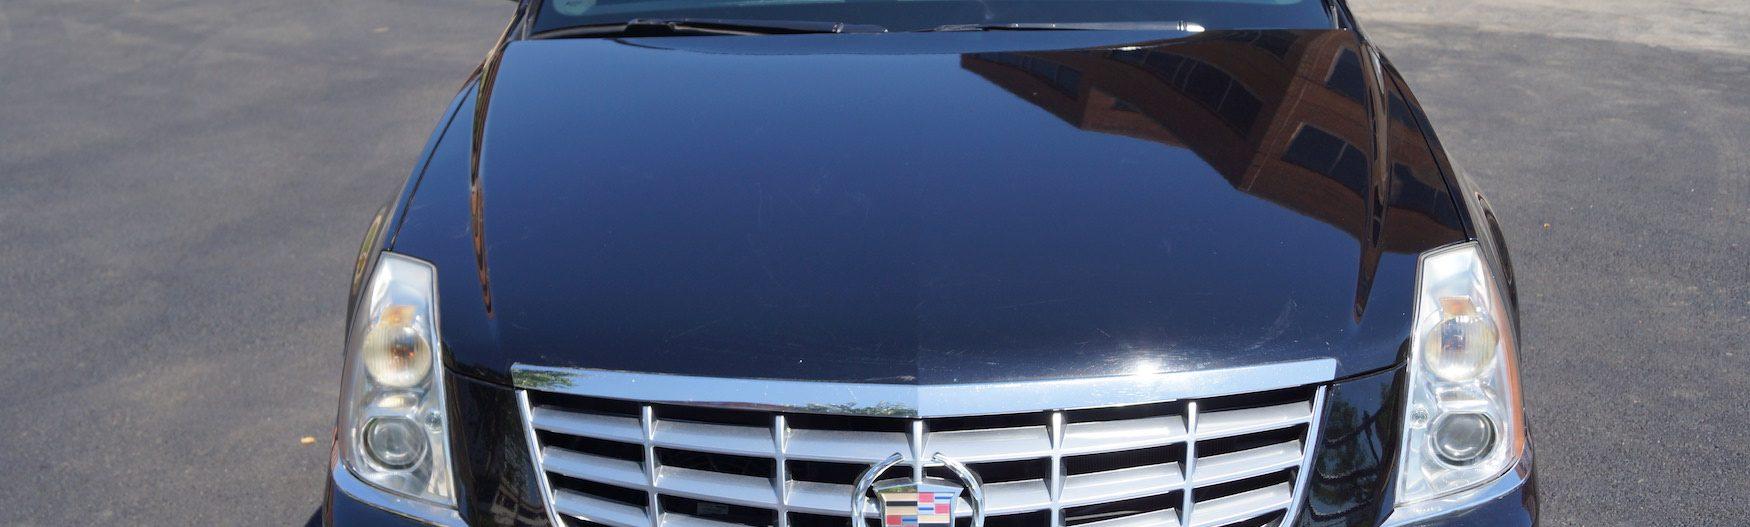 2006 Cadillac Ambassador DTS